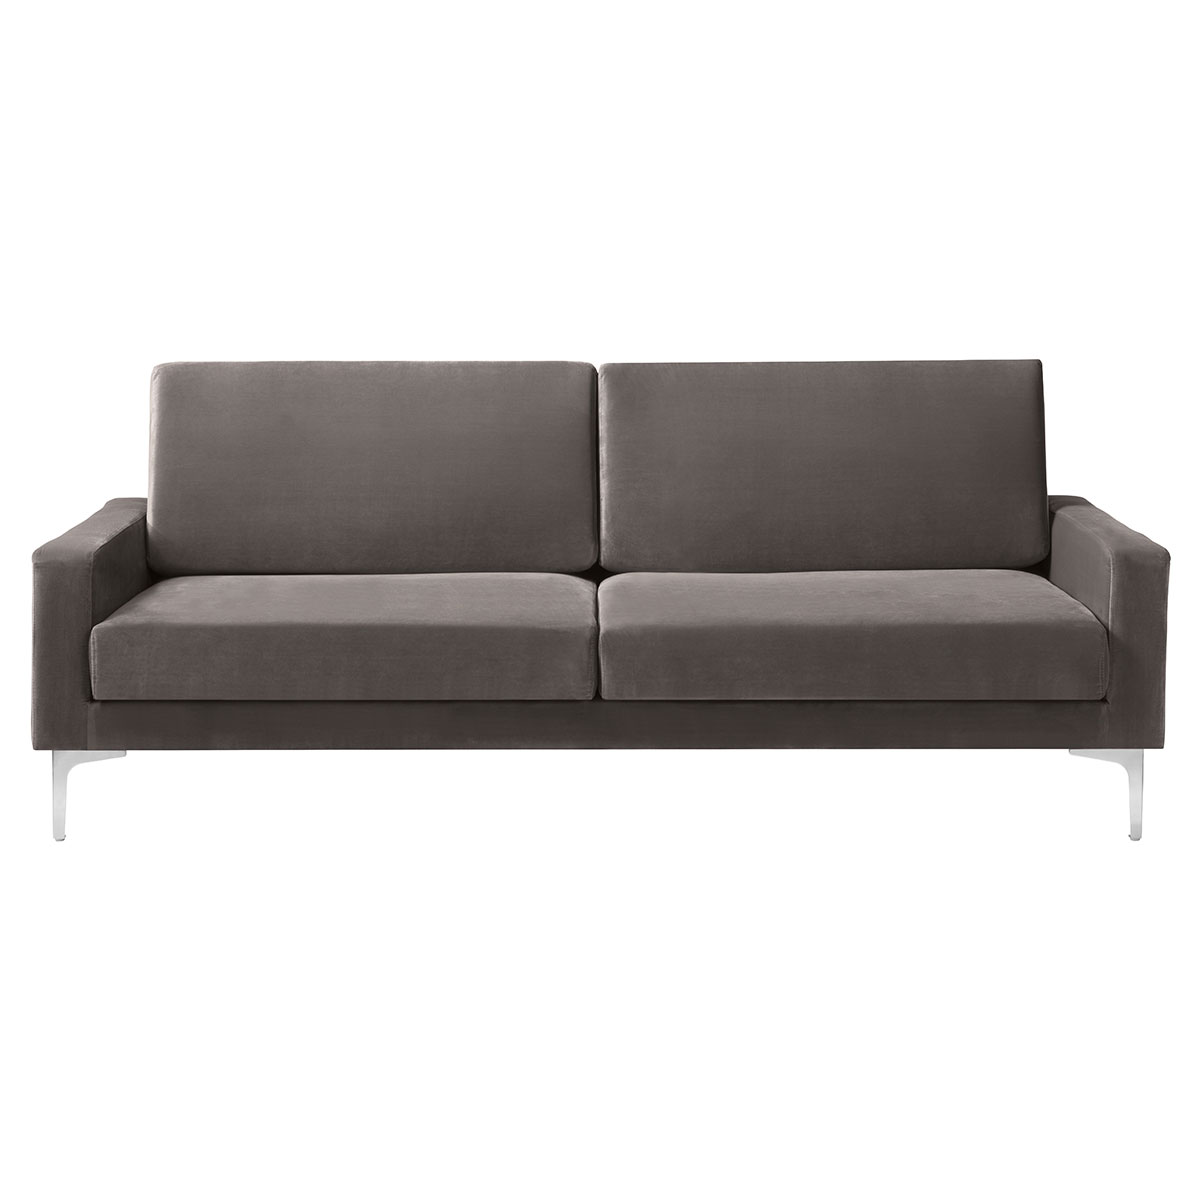 Living&more 3 pers. sofa - Viktoria - Mushroom